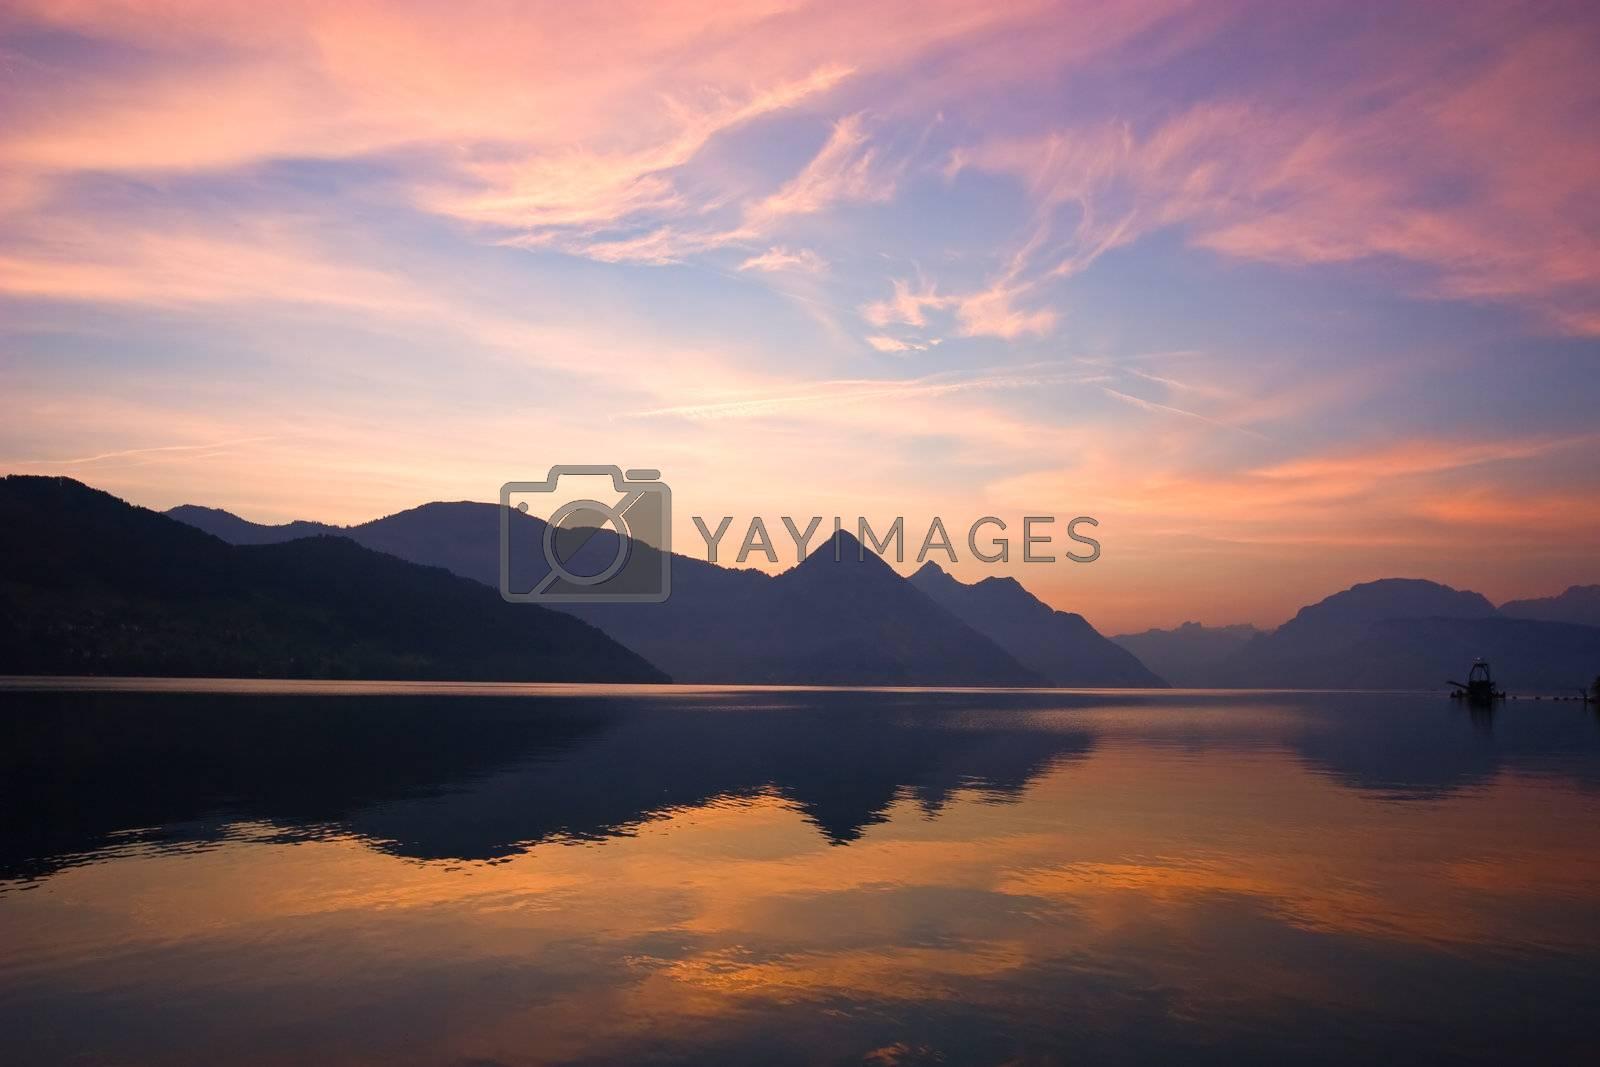 Beautiful sunrise over mountains, reflected on lake. Central Switzerland.